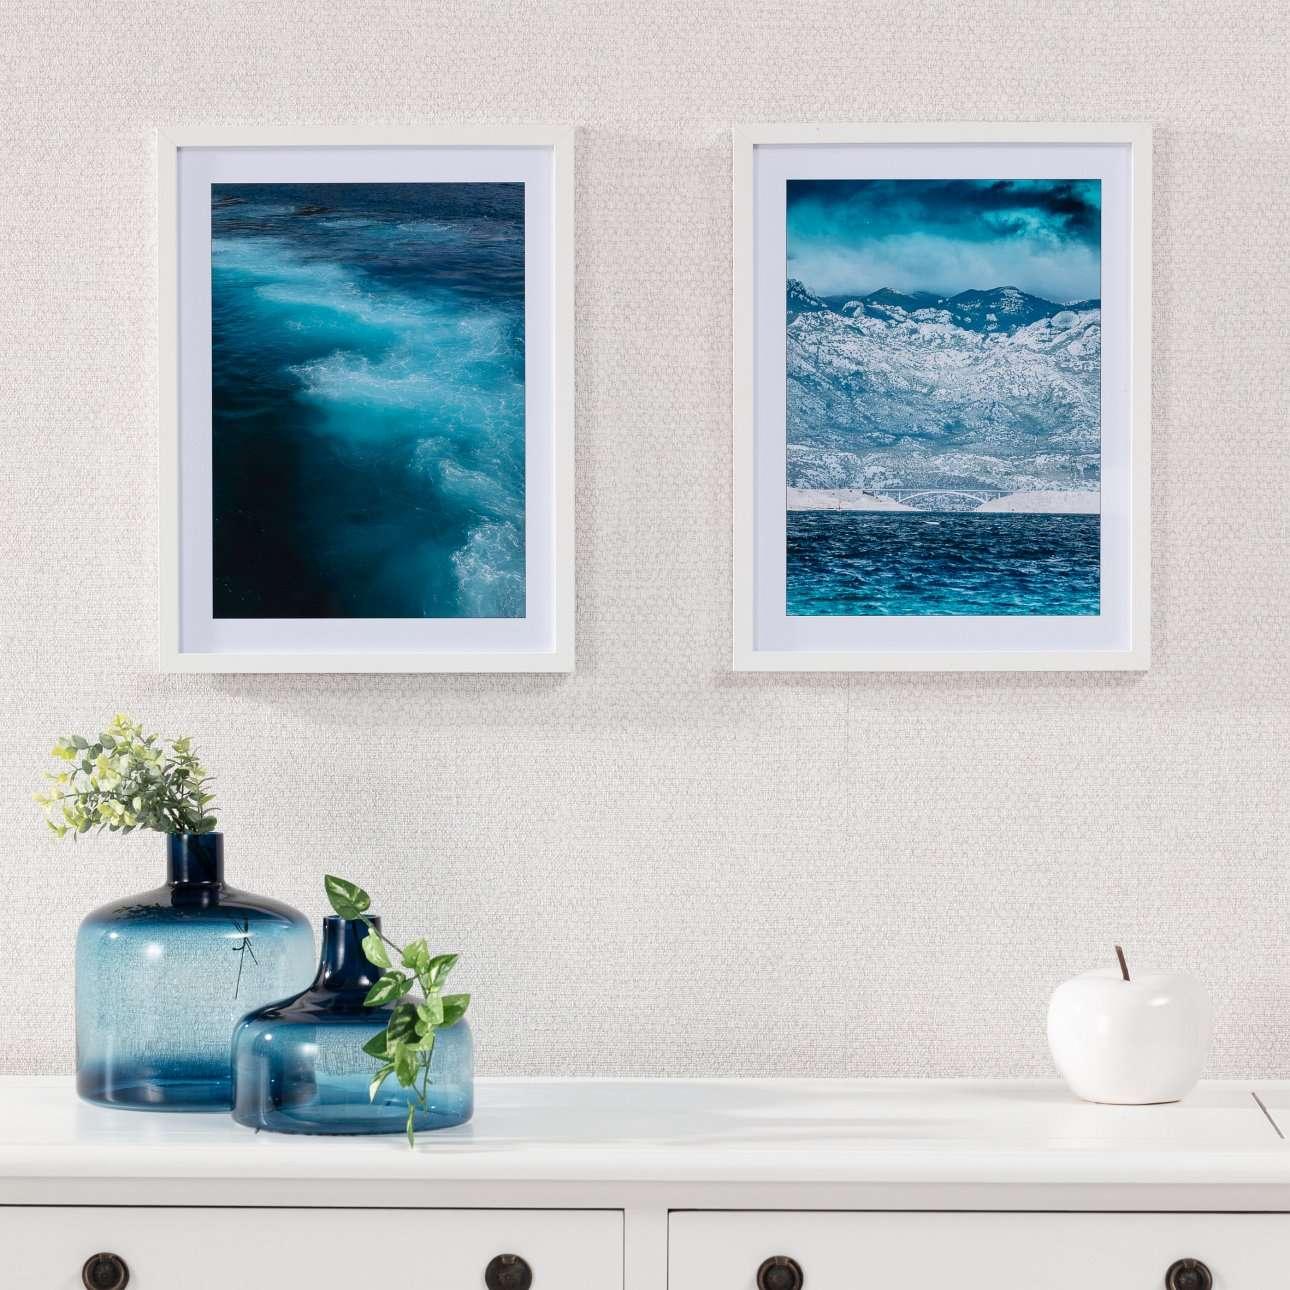 Obraz Blue Water II 30x40cm